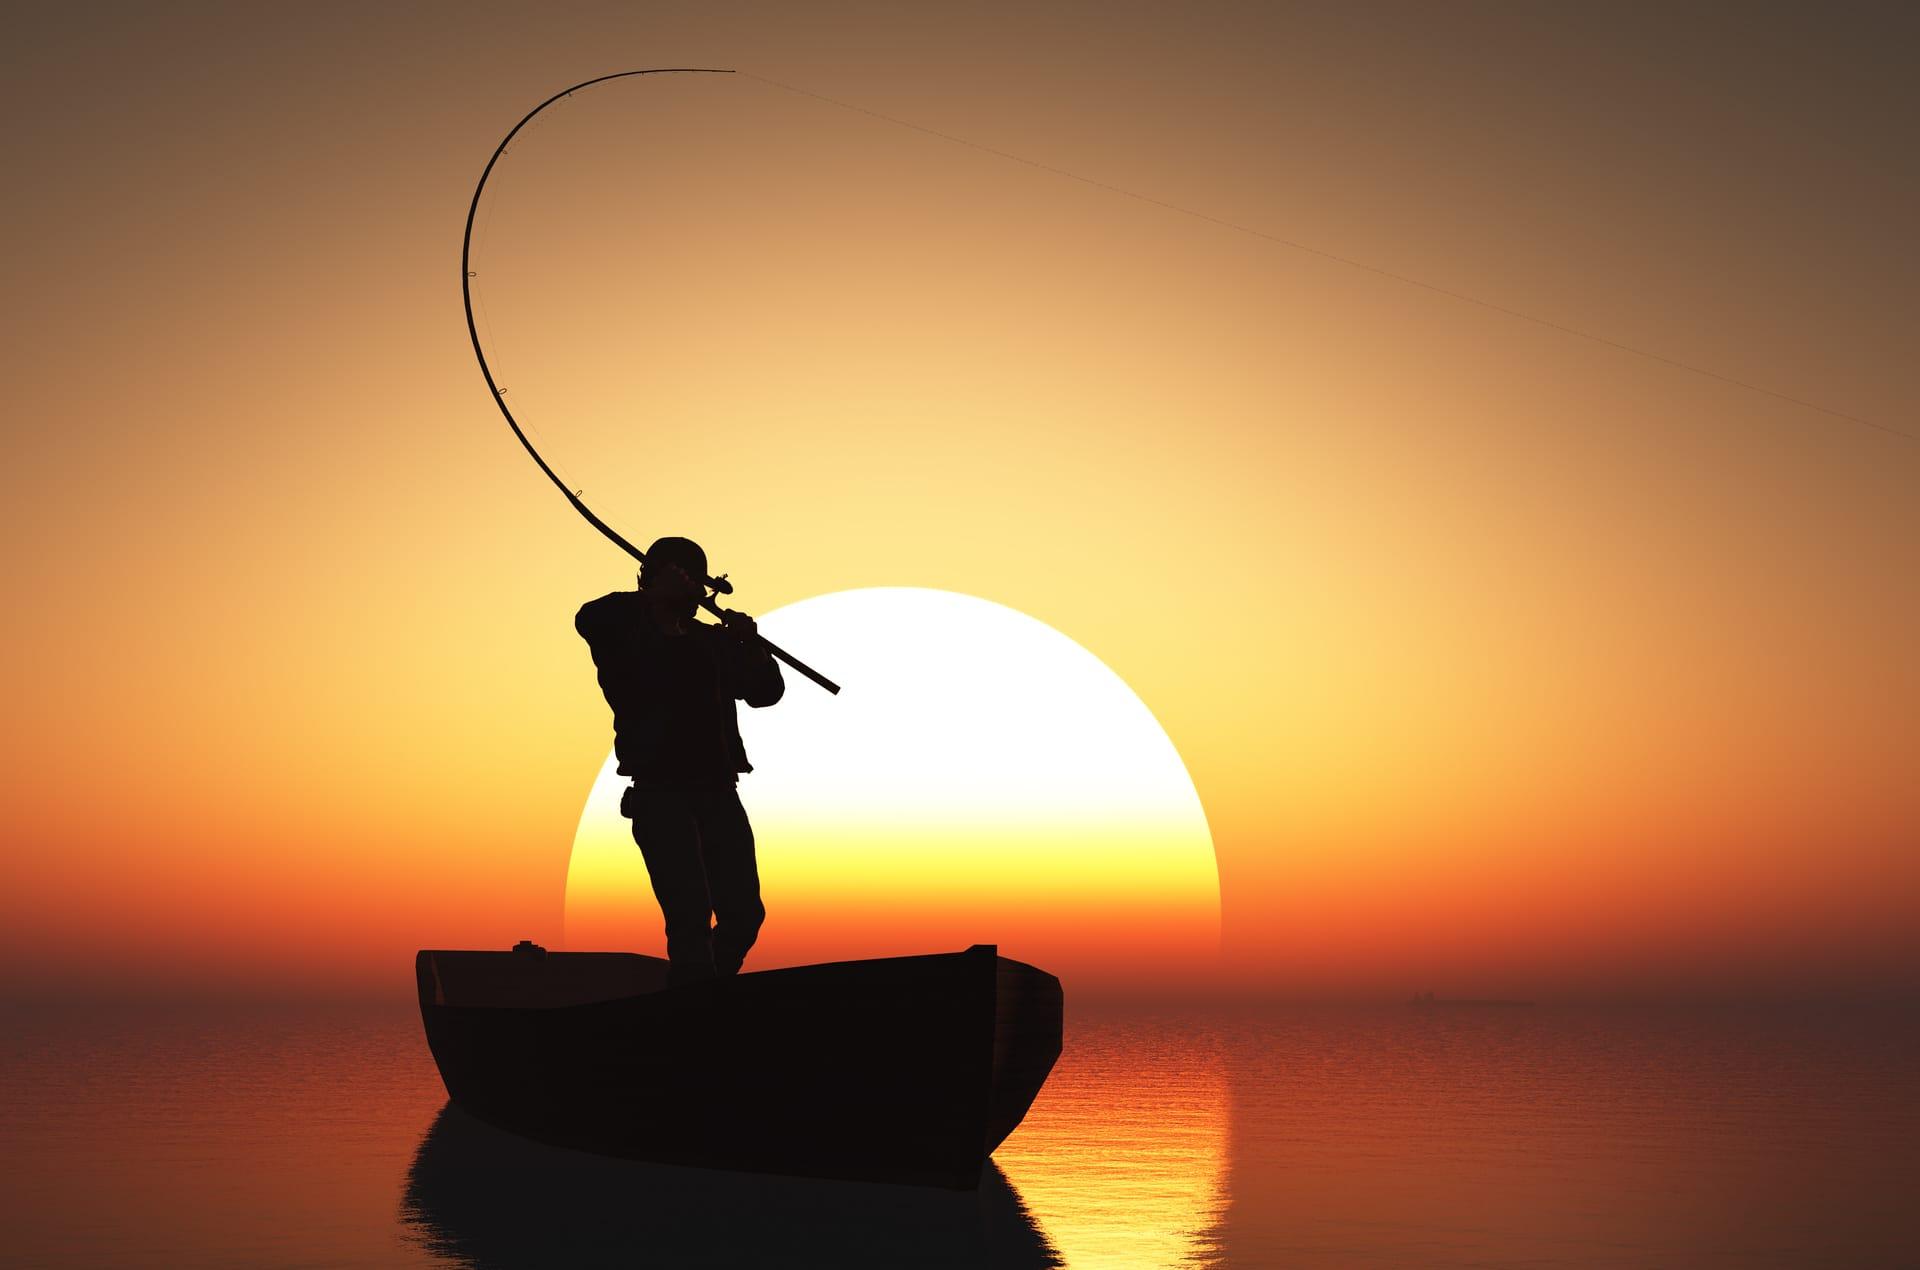 Man Fishing in Sunrise